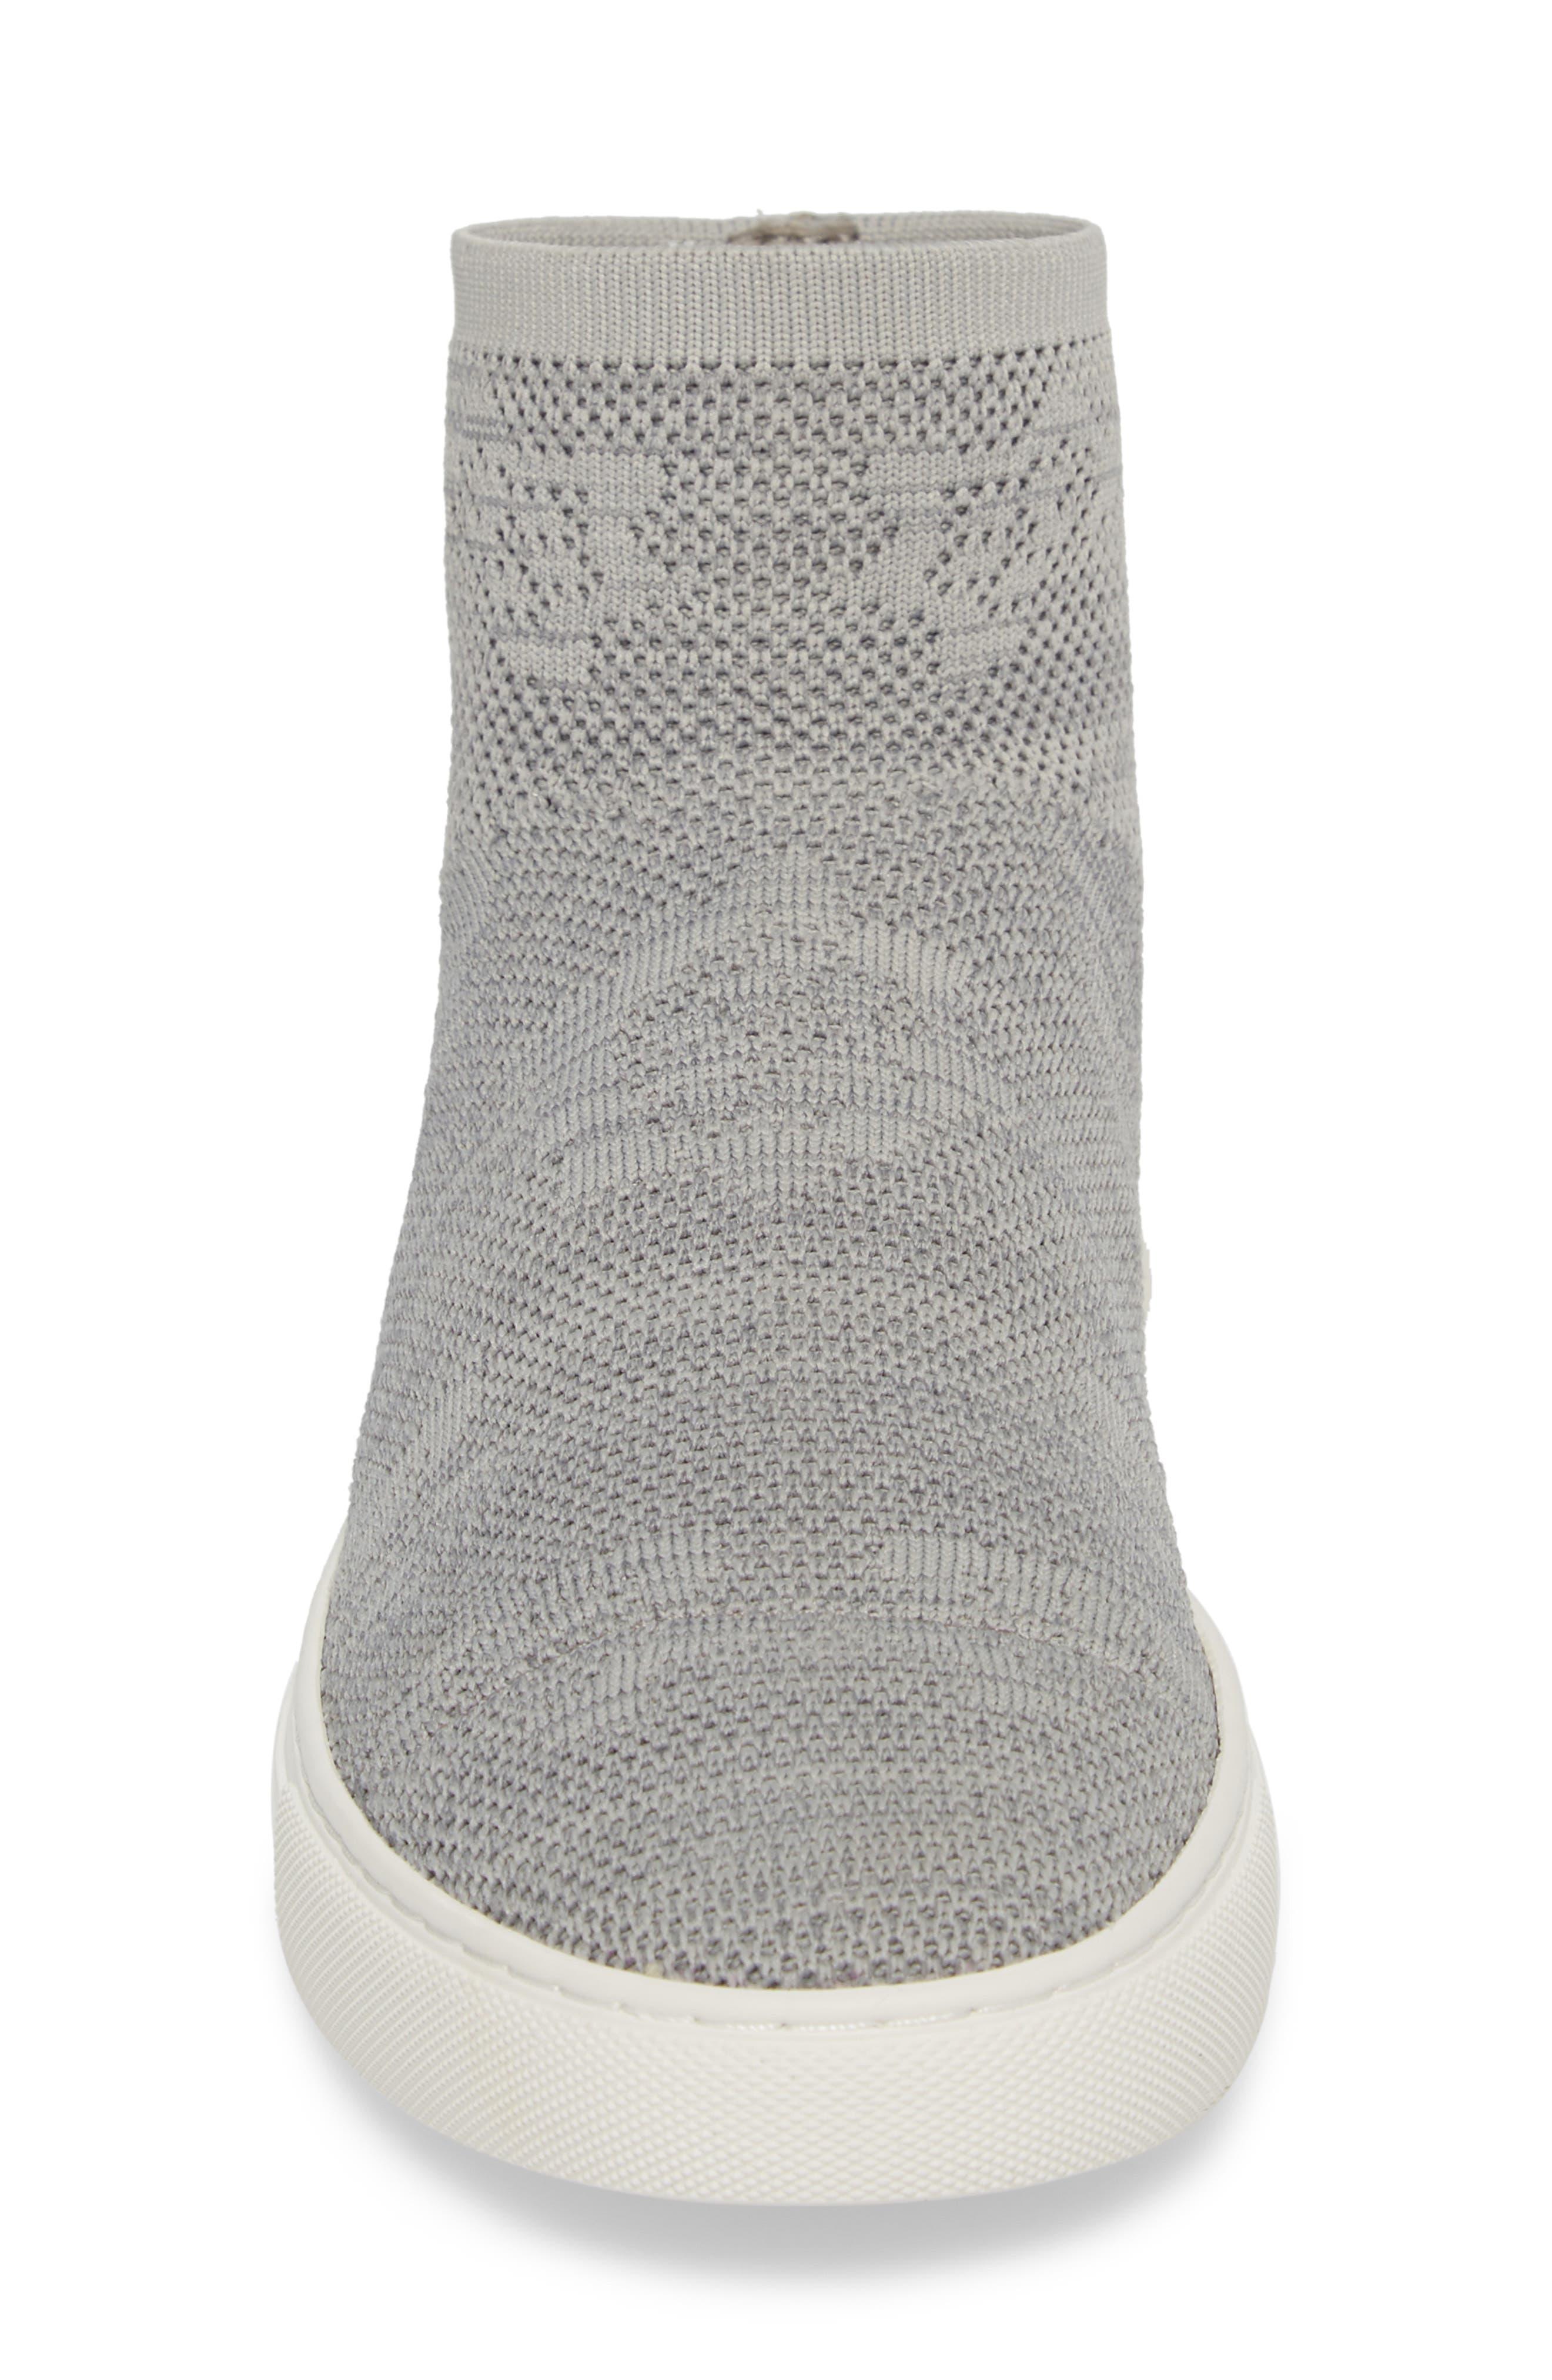 Keating Sneaker,                             Alternate thumbnail 4, color,                             Dust Grey Fabric